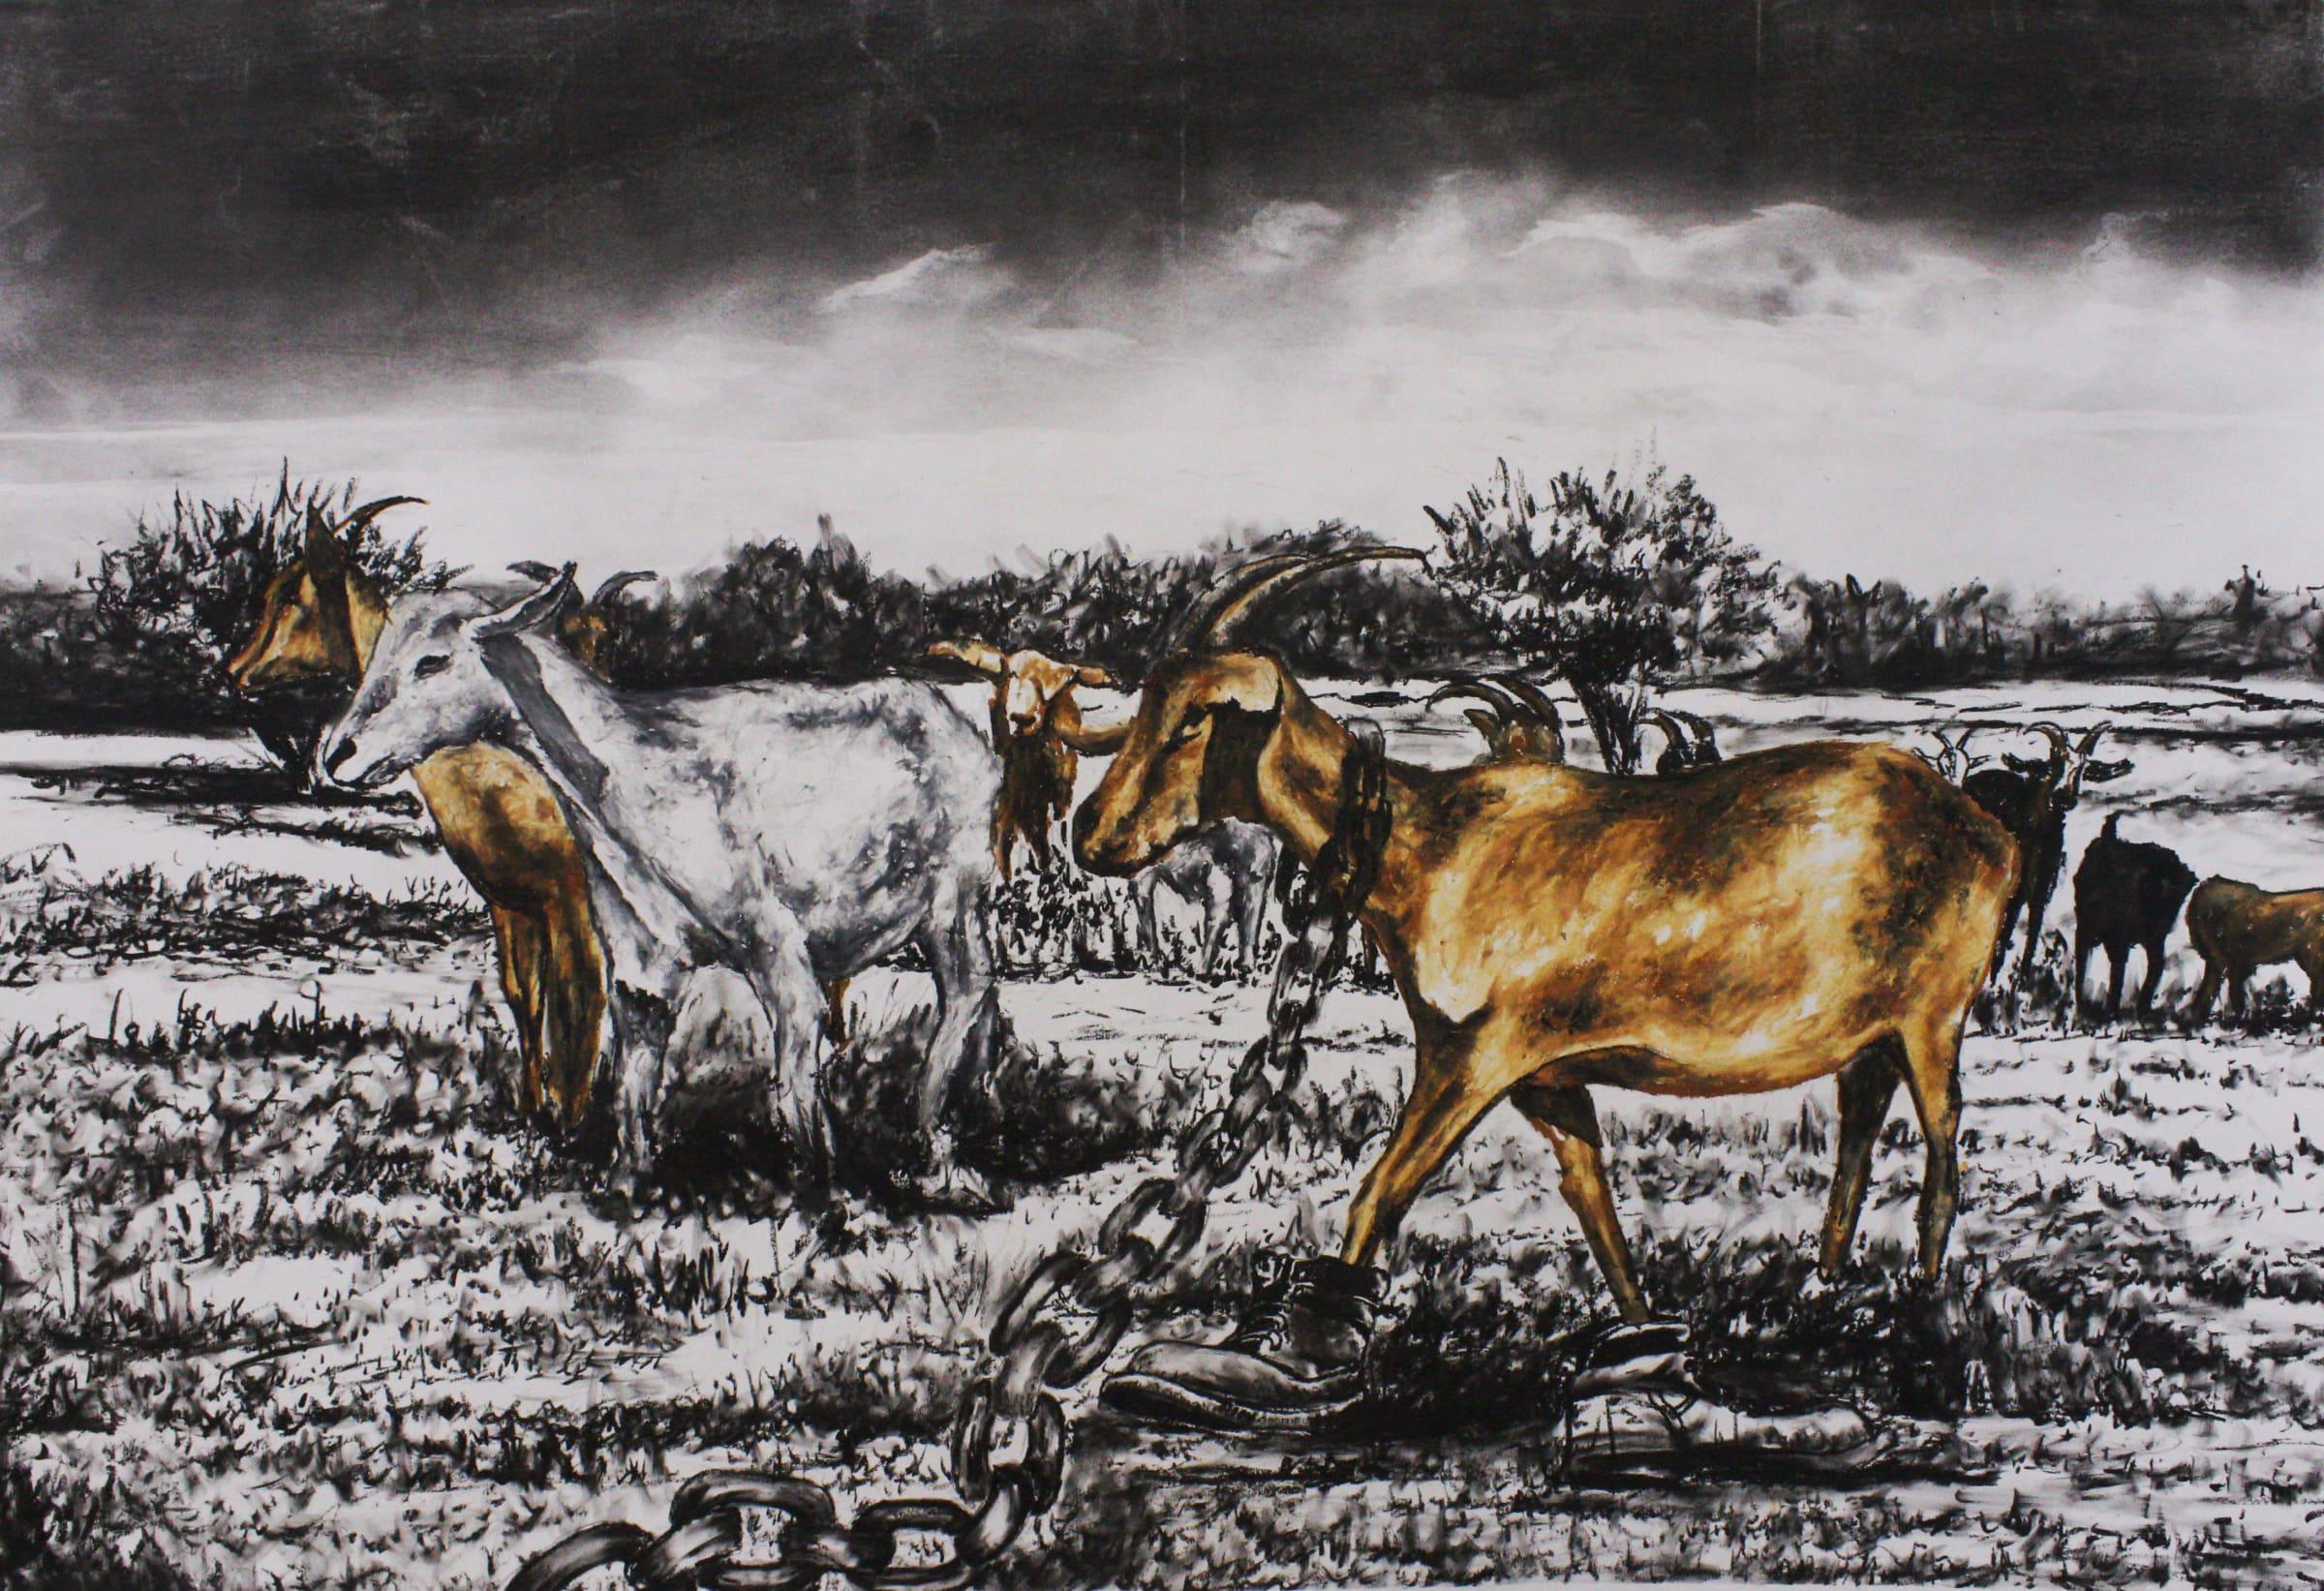 <span class=&#34;link fancybox-details-link&#34;><a href=&#34;/artists/98-walter-fumani-maluleke/works/1575-walter-fumani-maluleke-vuhlonga-a-byi-heli-2018/&#34;>View Detail Page</a></span><div class=&#34;artist&#34;><strong>Walter Fumani Maluleke</strong></div> <div class=&#34;title&#34;><em>Vuhlonga A Byi Heli</em>, 2018</div> <div class=&#34;medium&#34;>Charcoal On Frabriano Paper</div> <div class=&#34;dimensions&#34;>118.5cm x 84.5cm (135cm x 101cm framed)</div><div class=&#34;price&#34;>R12,000.00</div>